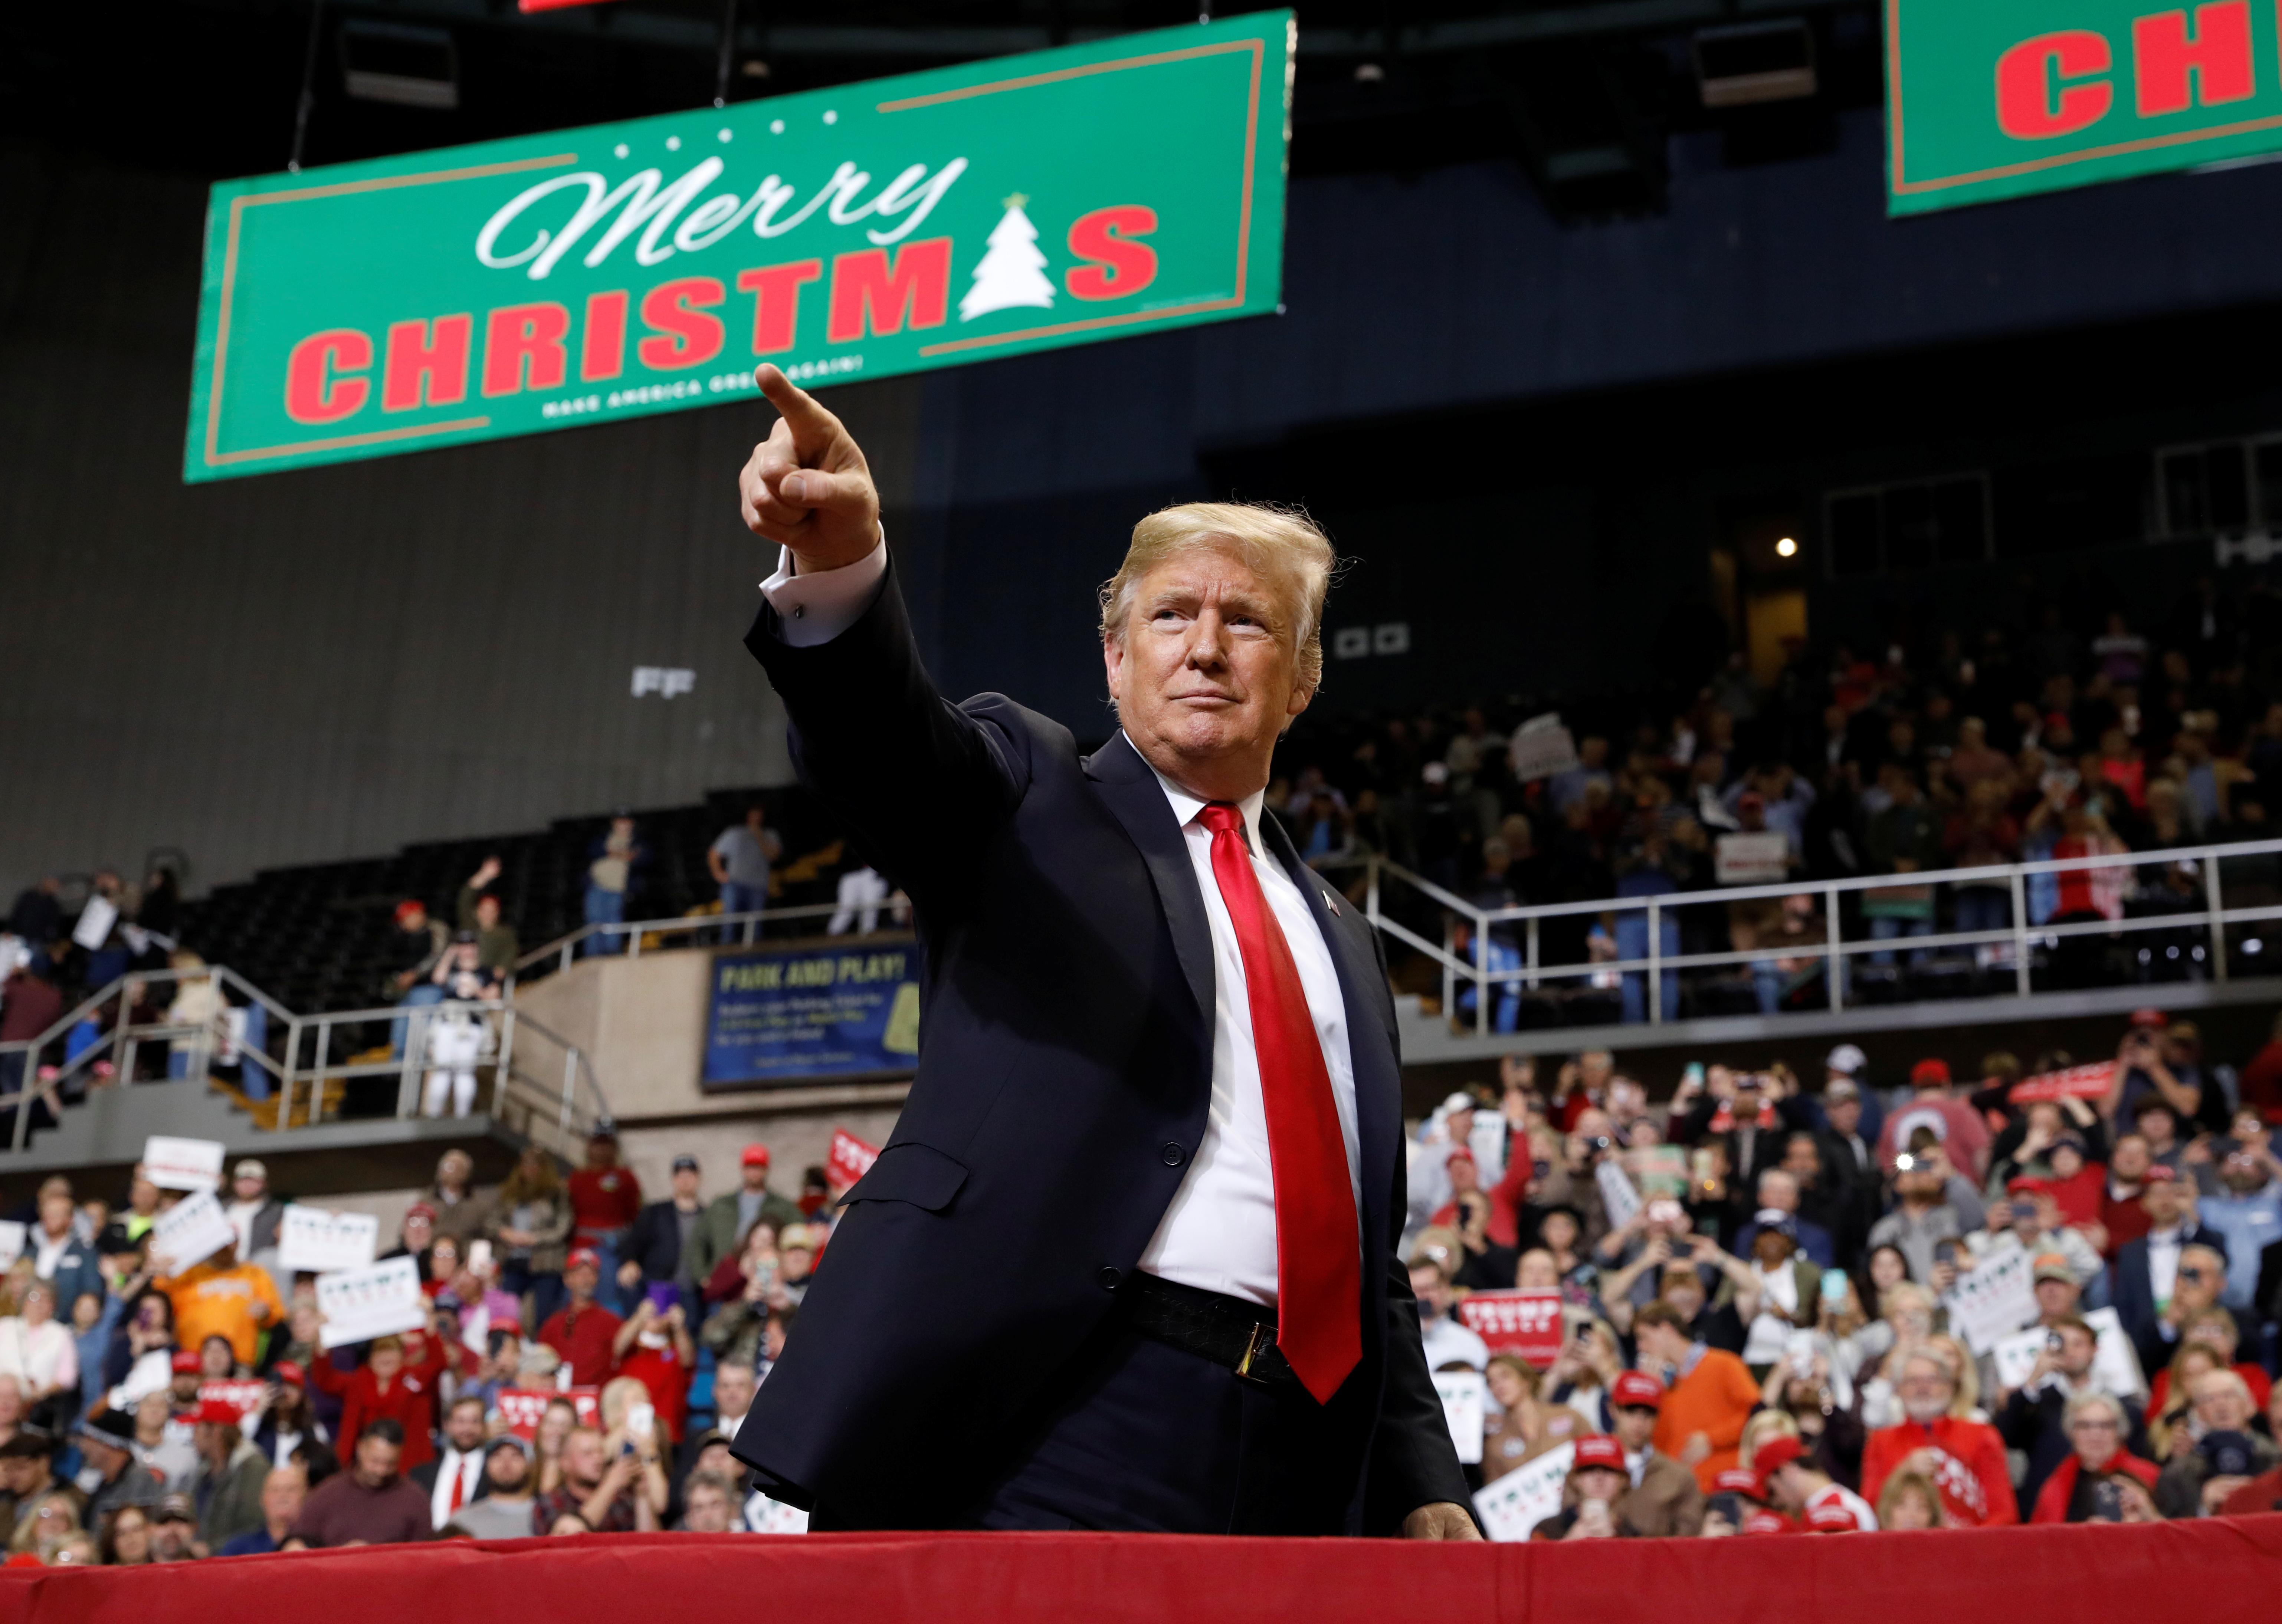 U.S. President Trump gestures during a Make America Great Again rally in Biloxi